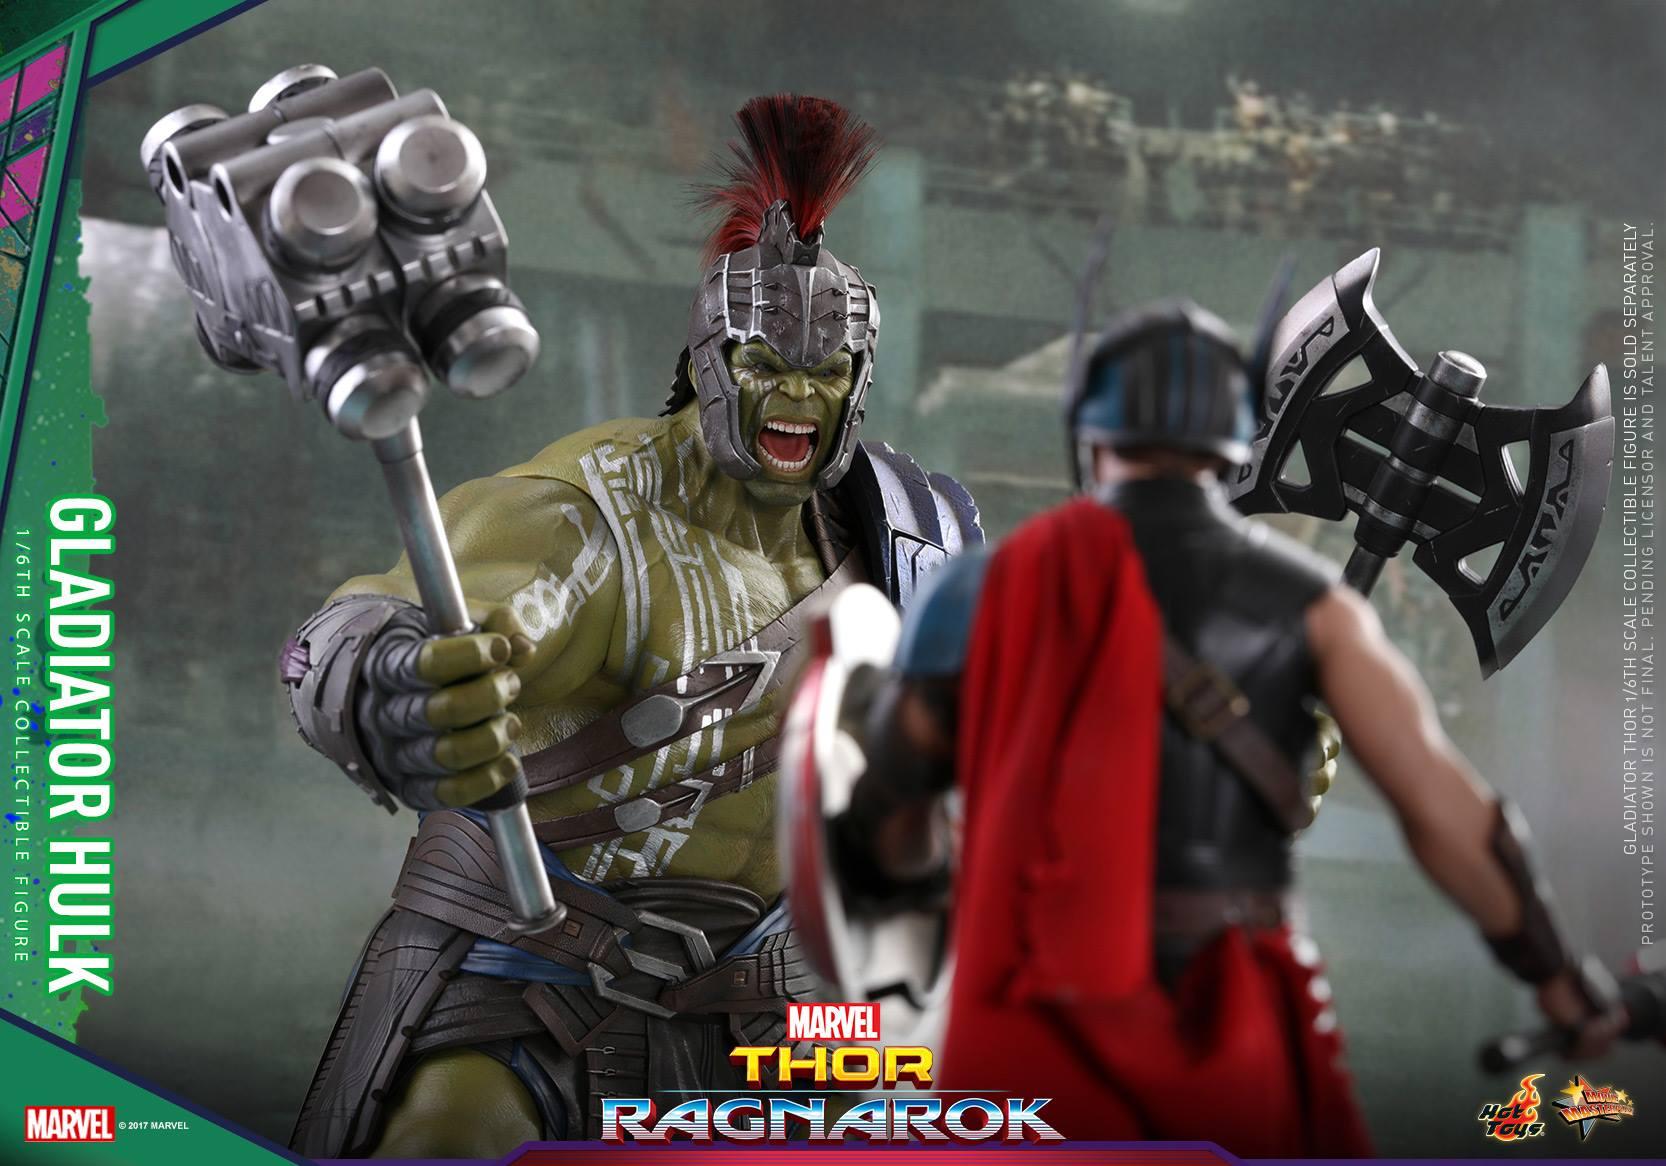 Hot Toys Thor: Ragnarok Hulk & Thor Sixth Scale Figures